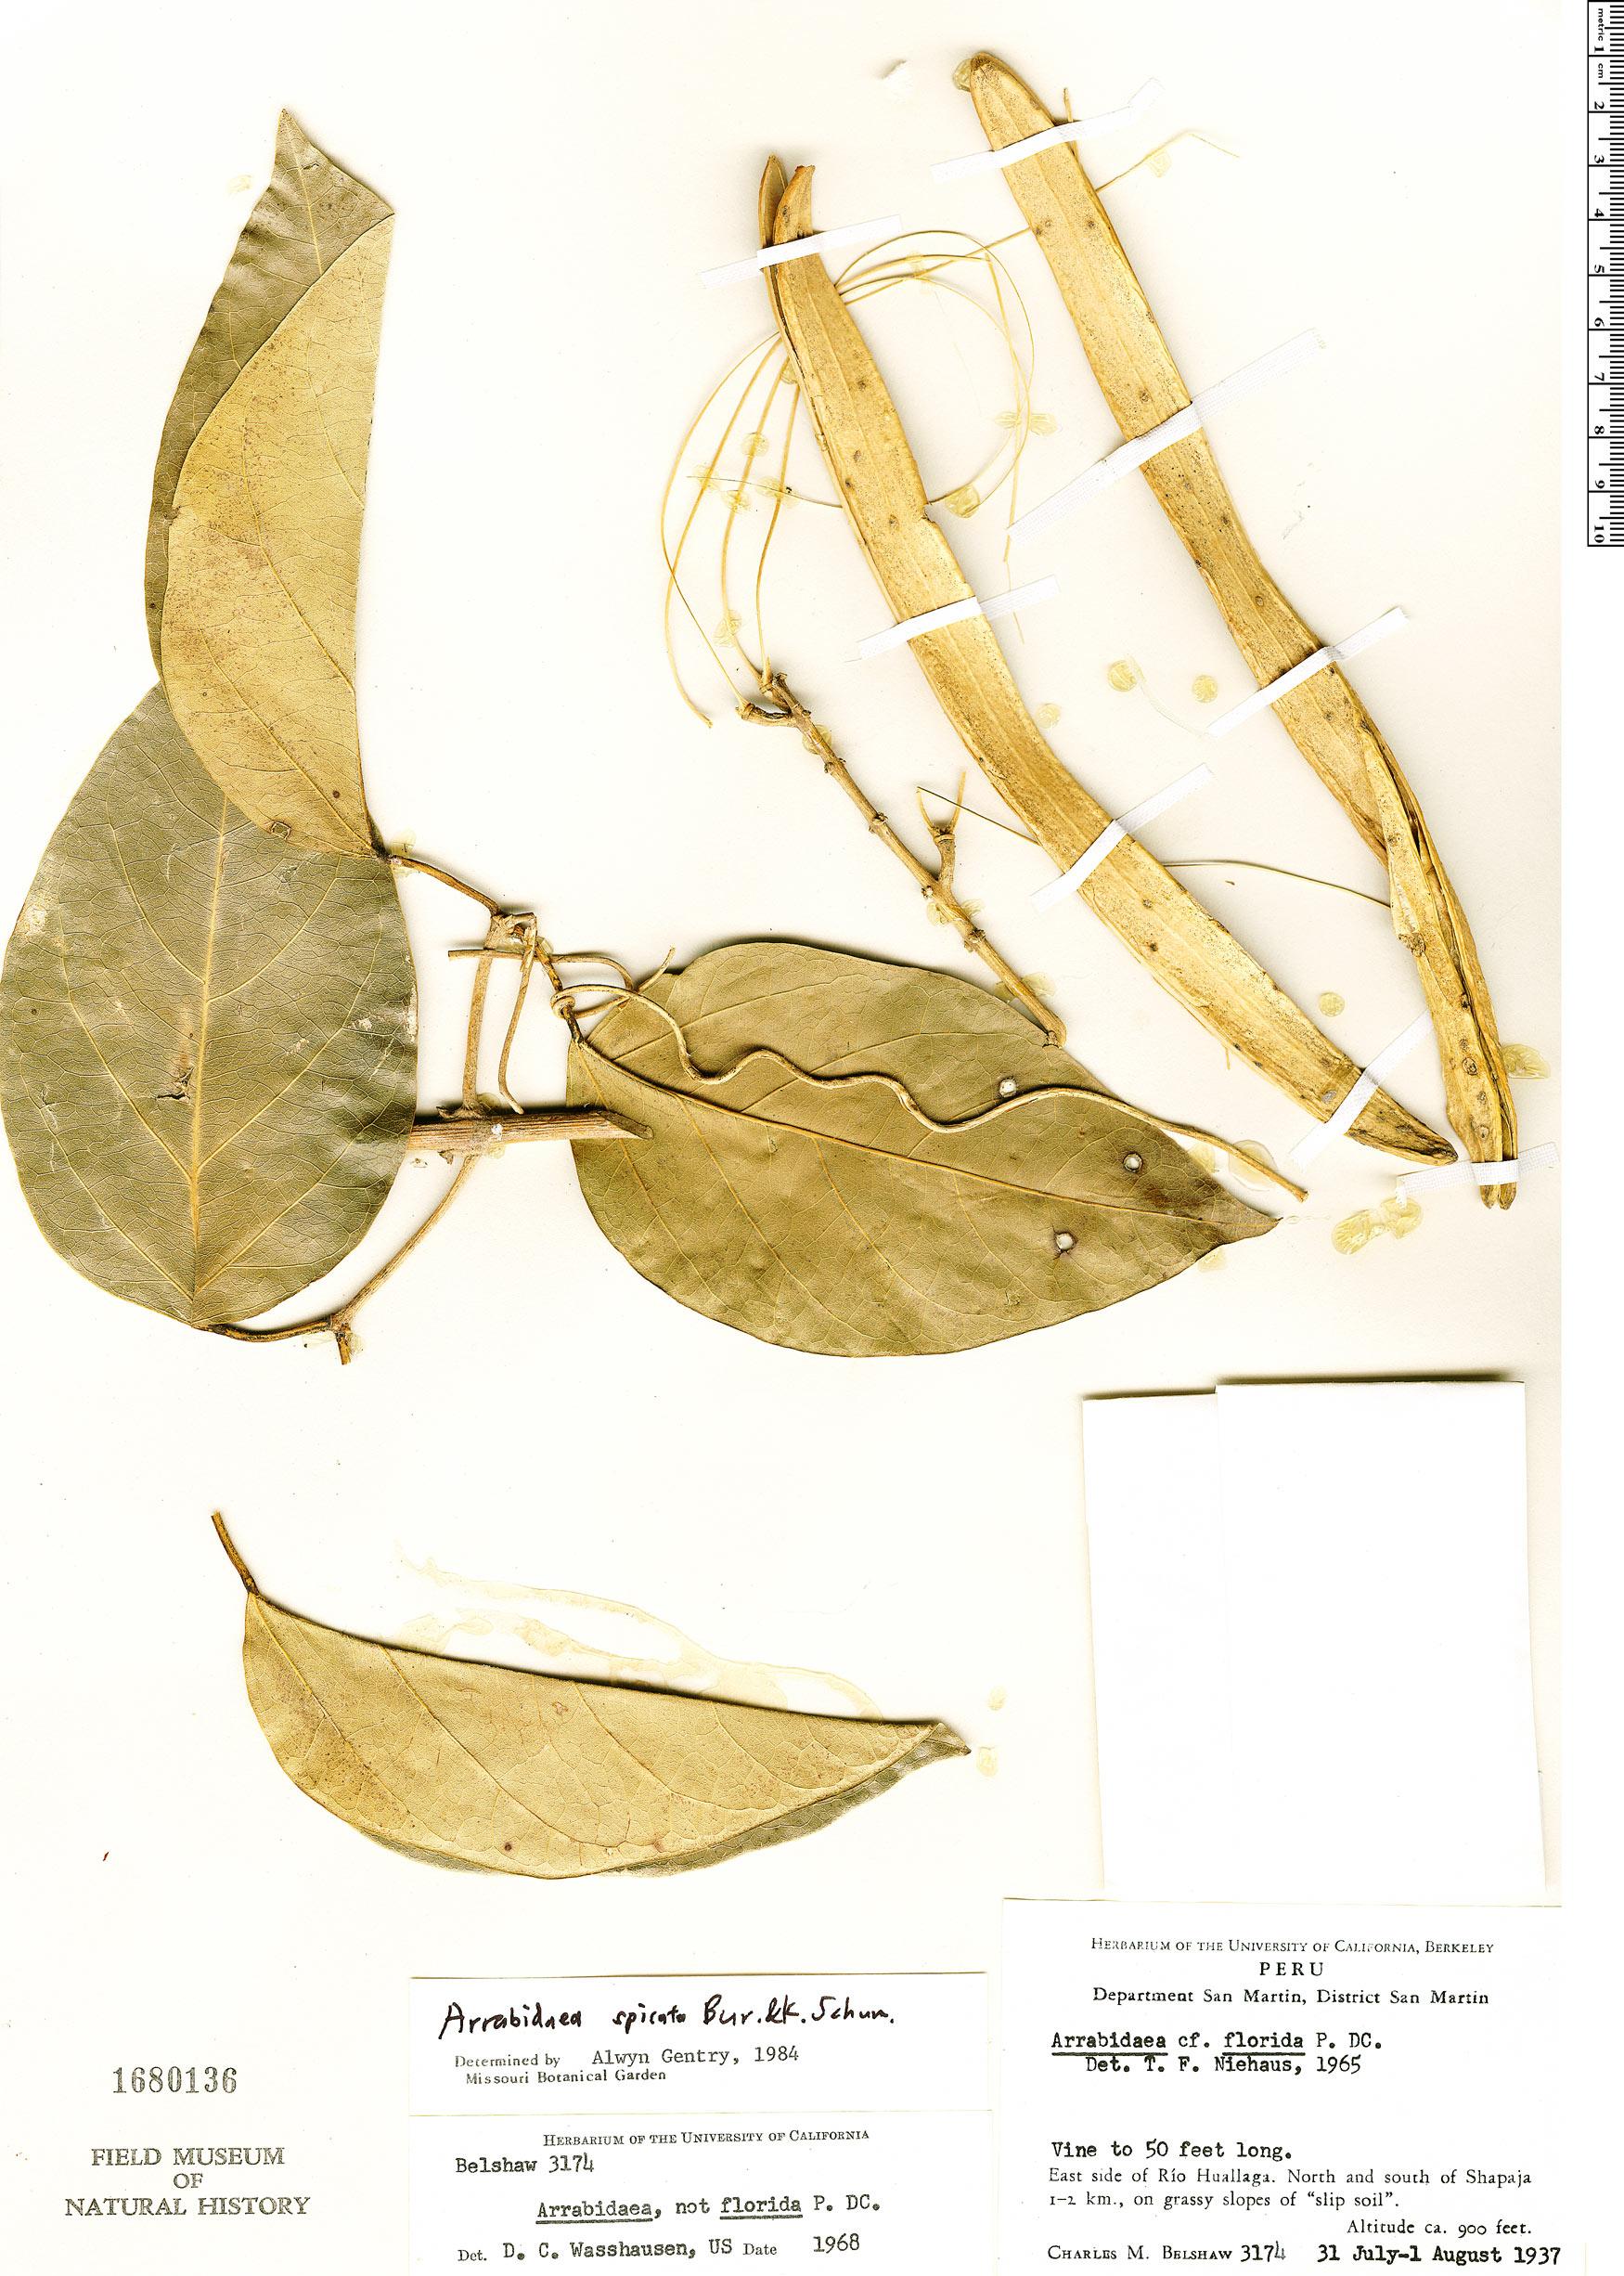 Espécimen: Fridericia spicata